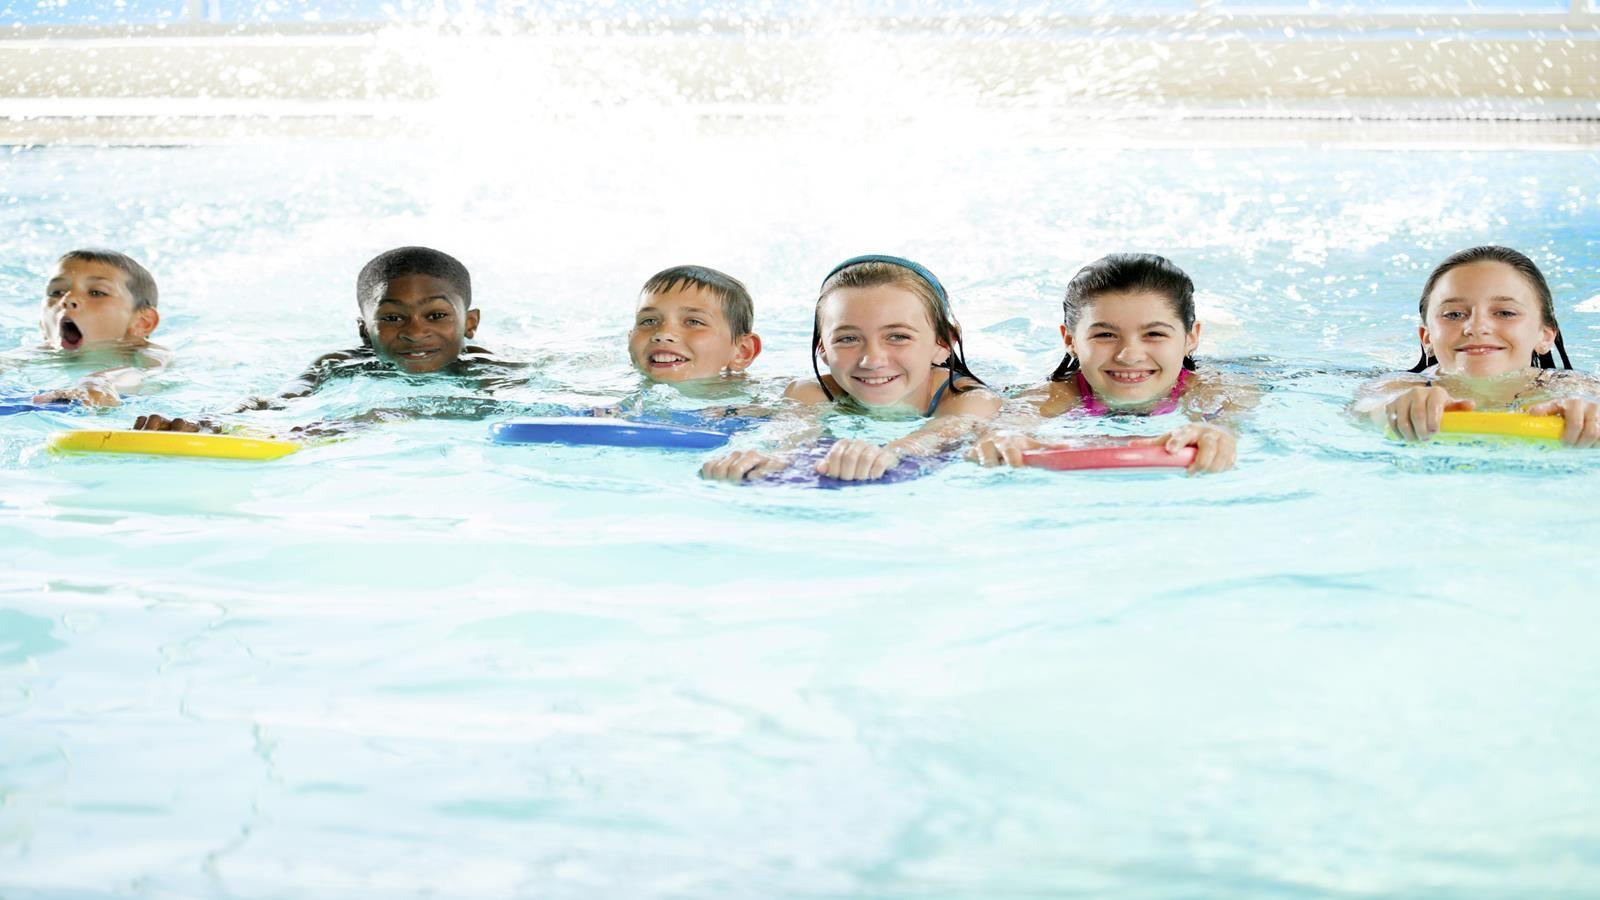 Kids Swimming wicklow hotels with swimming pool | druids glen hotel & golf resort